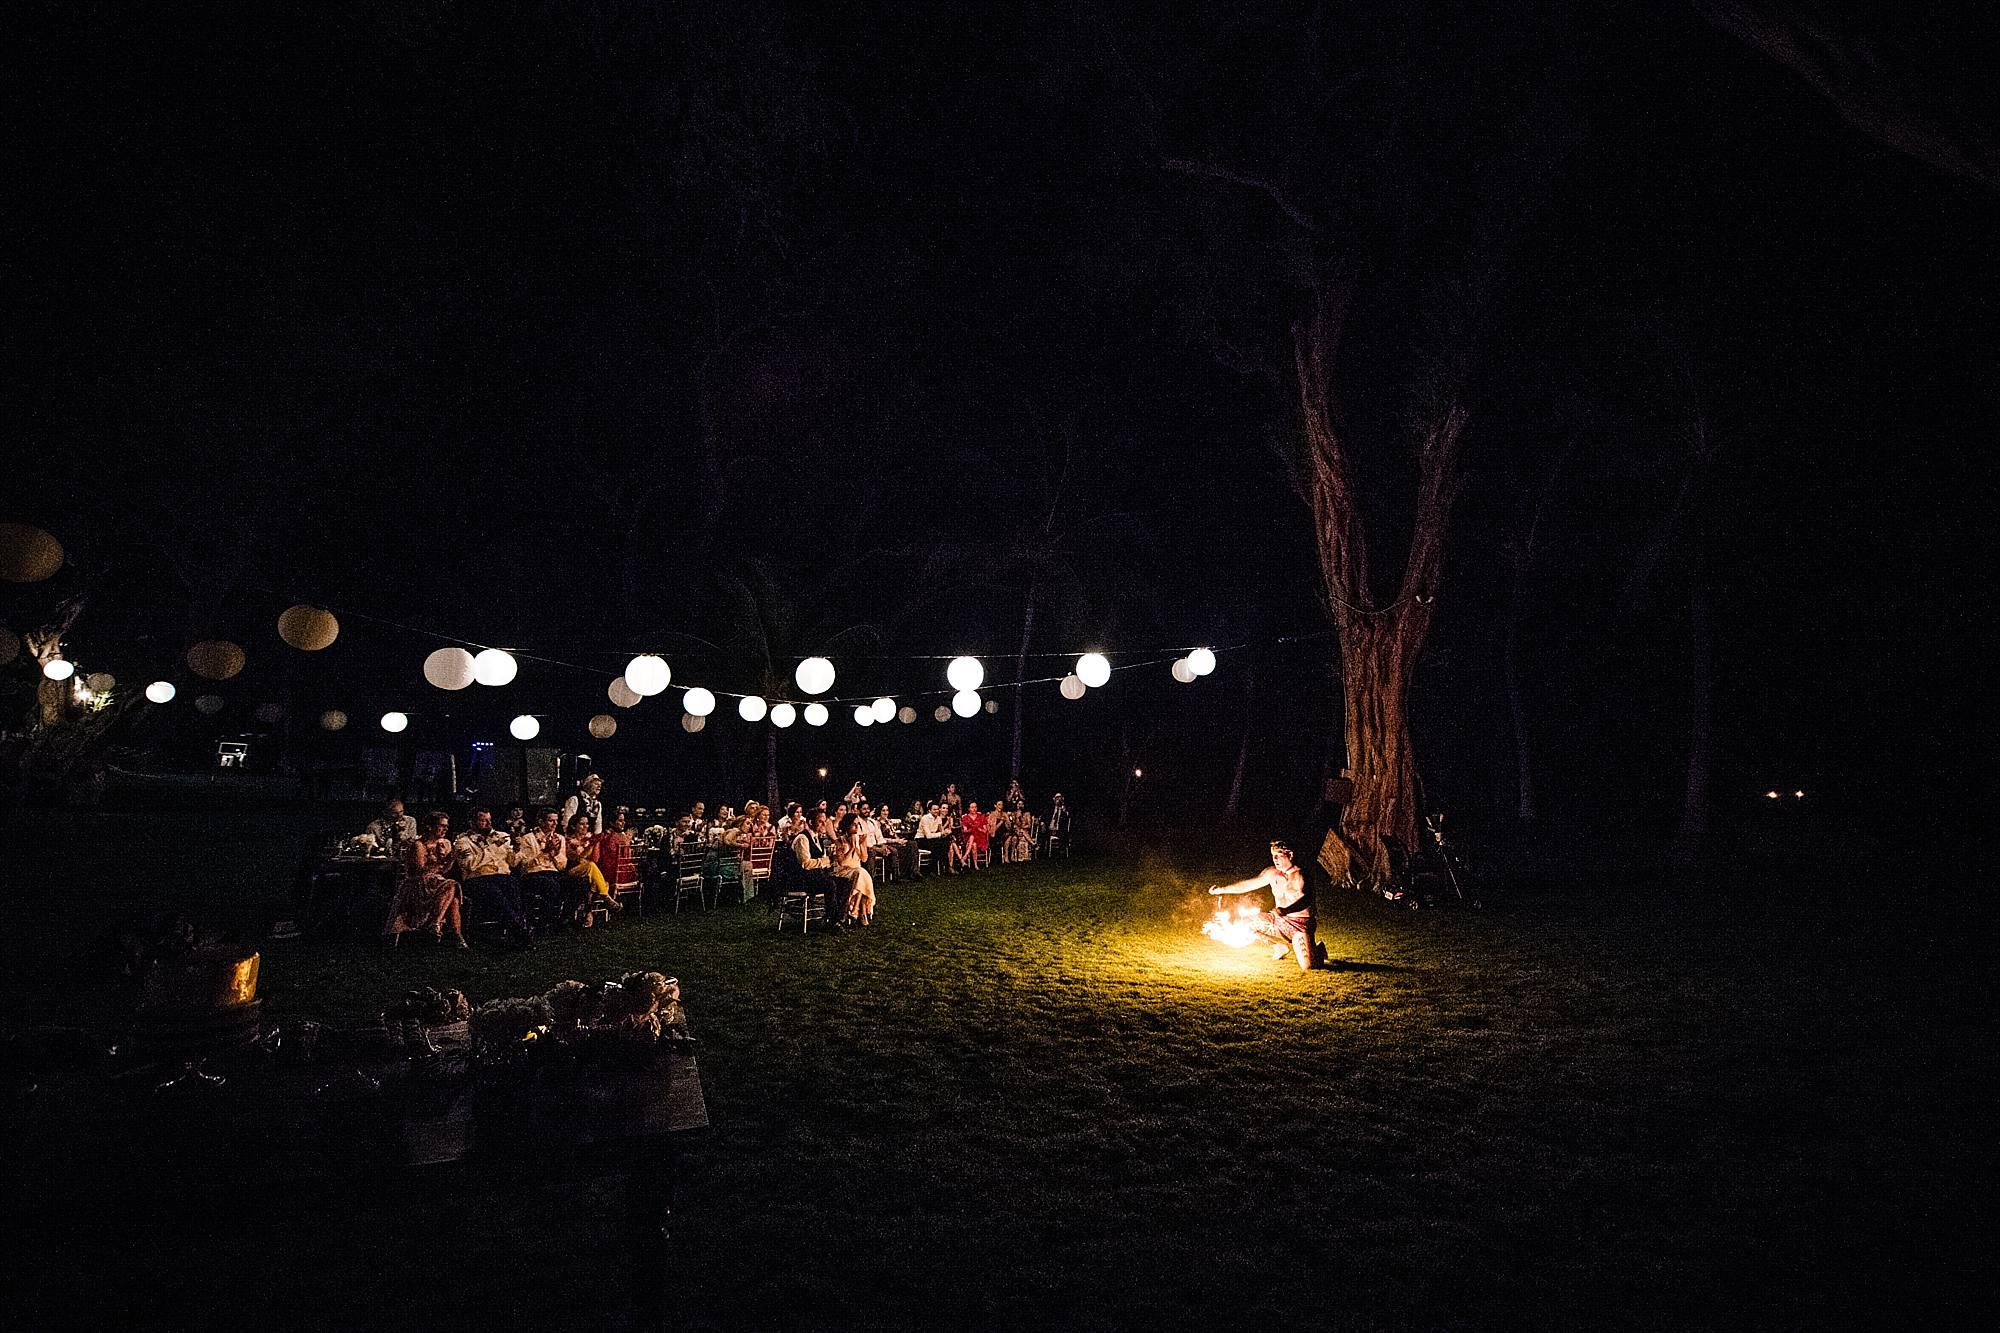 fire dancing at wedding